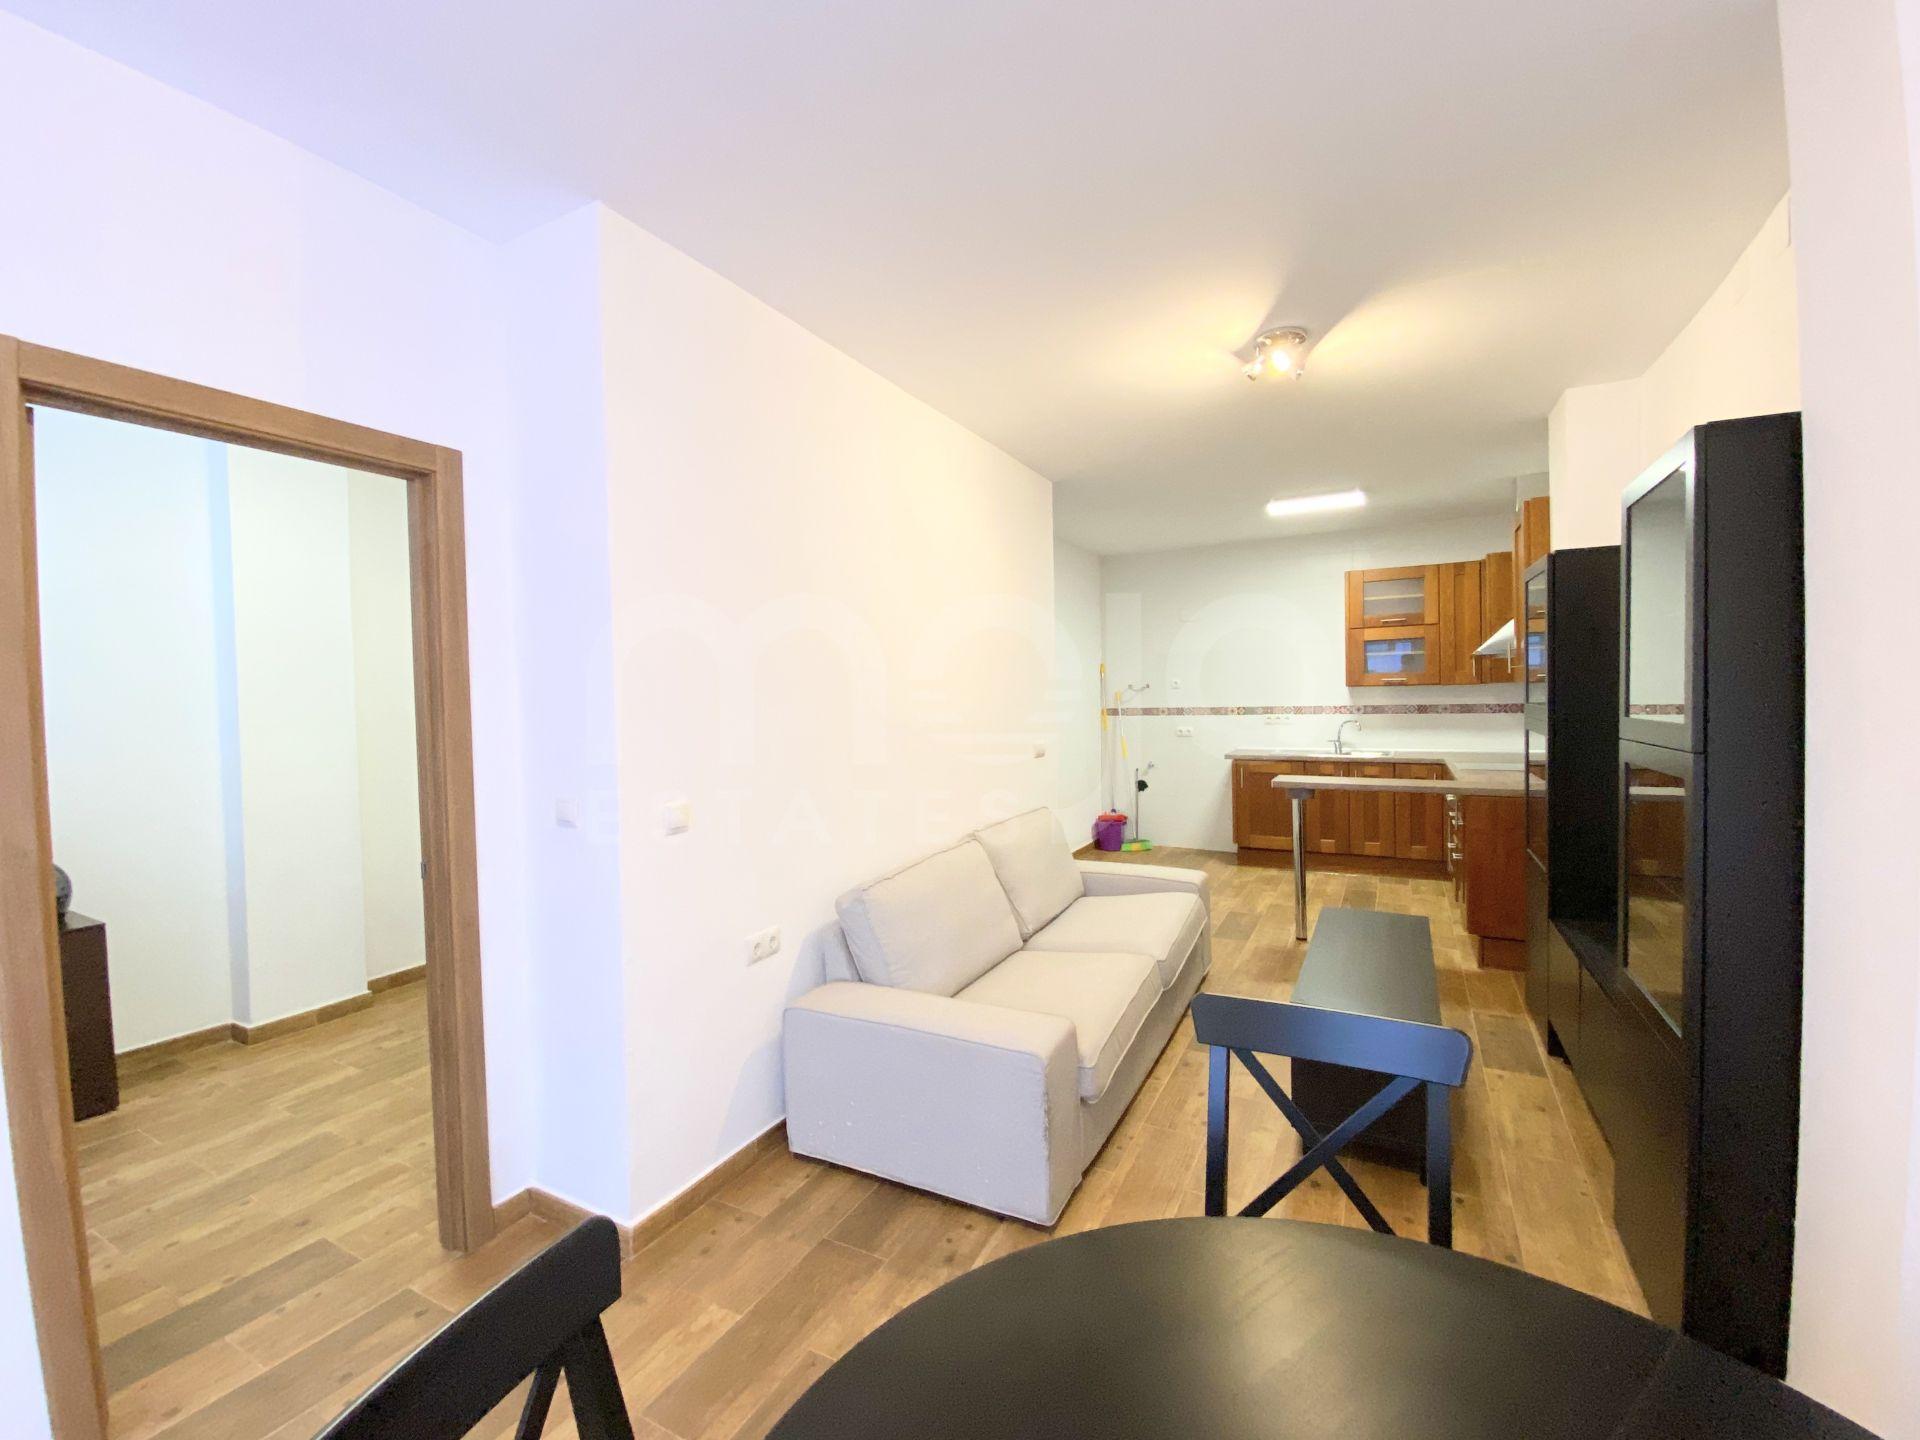 Lejlighed i stueetagen til salg i Girón - Las Delicias - Tabacalera, Malaga - Carretera de Cádiz